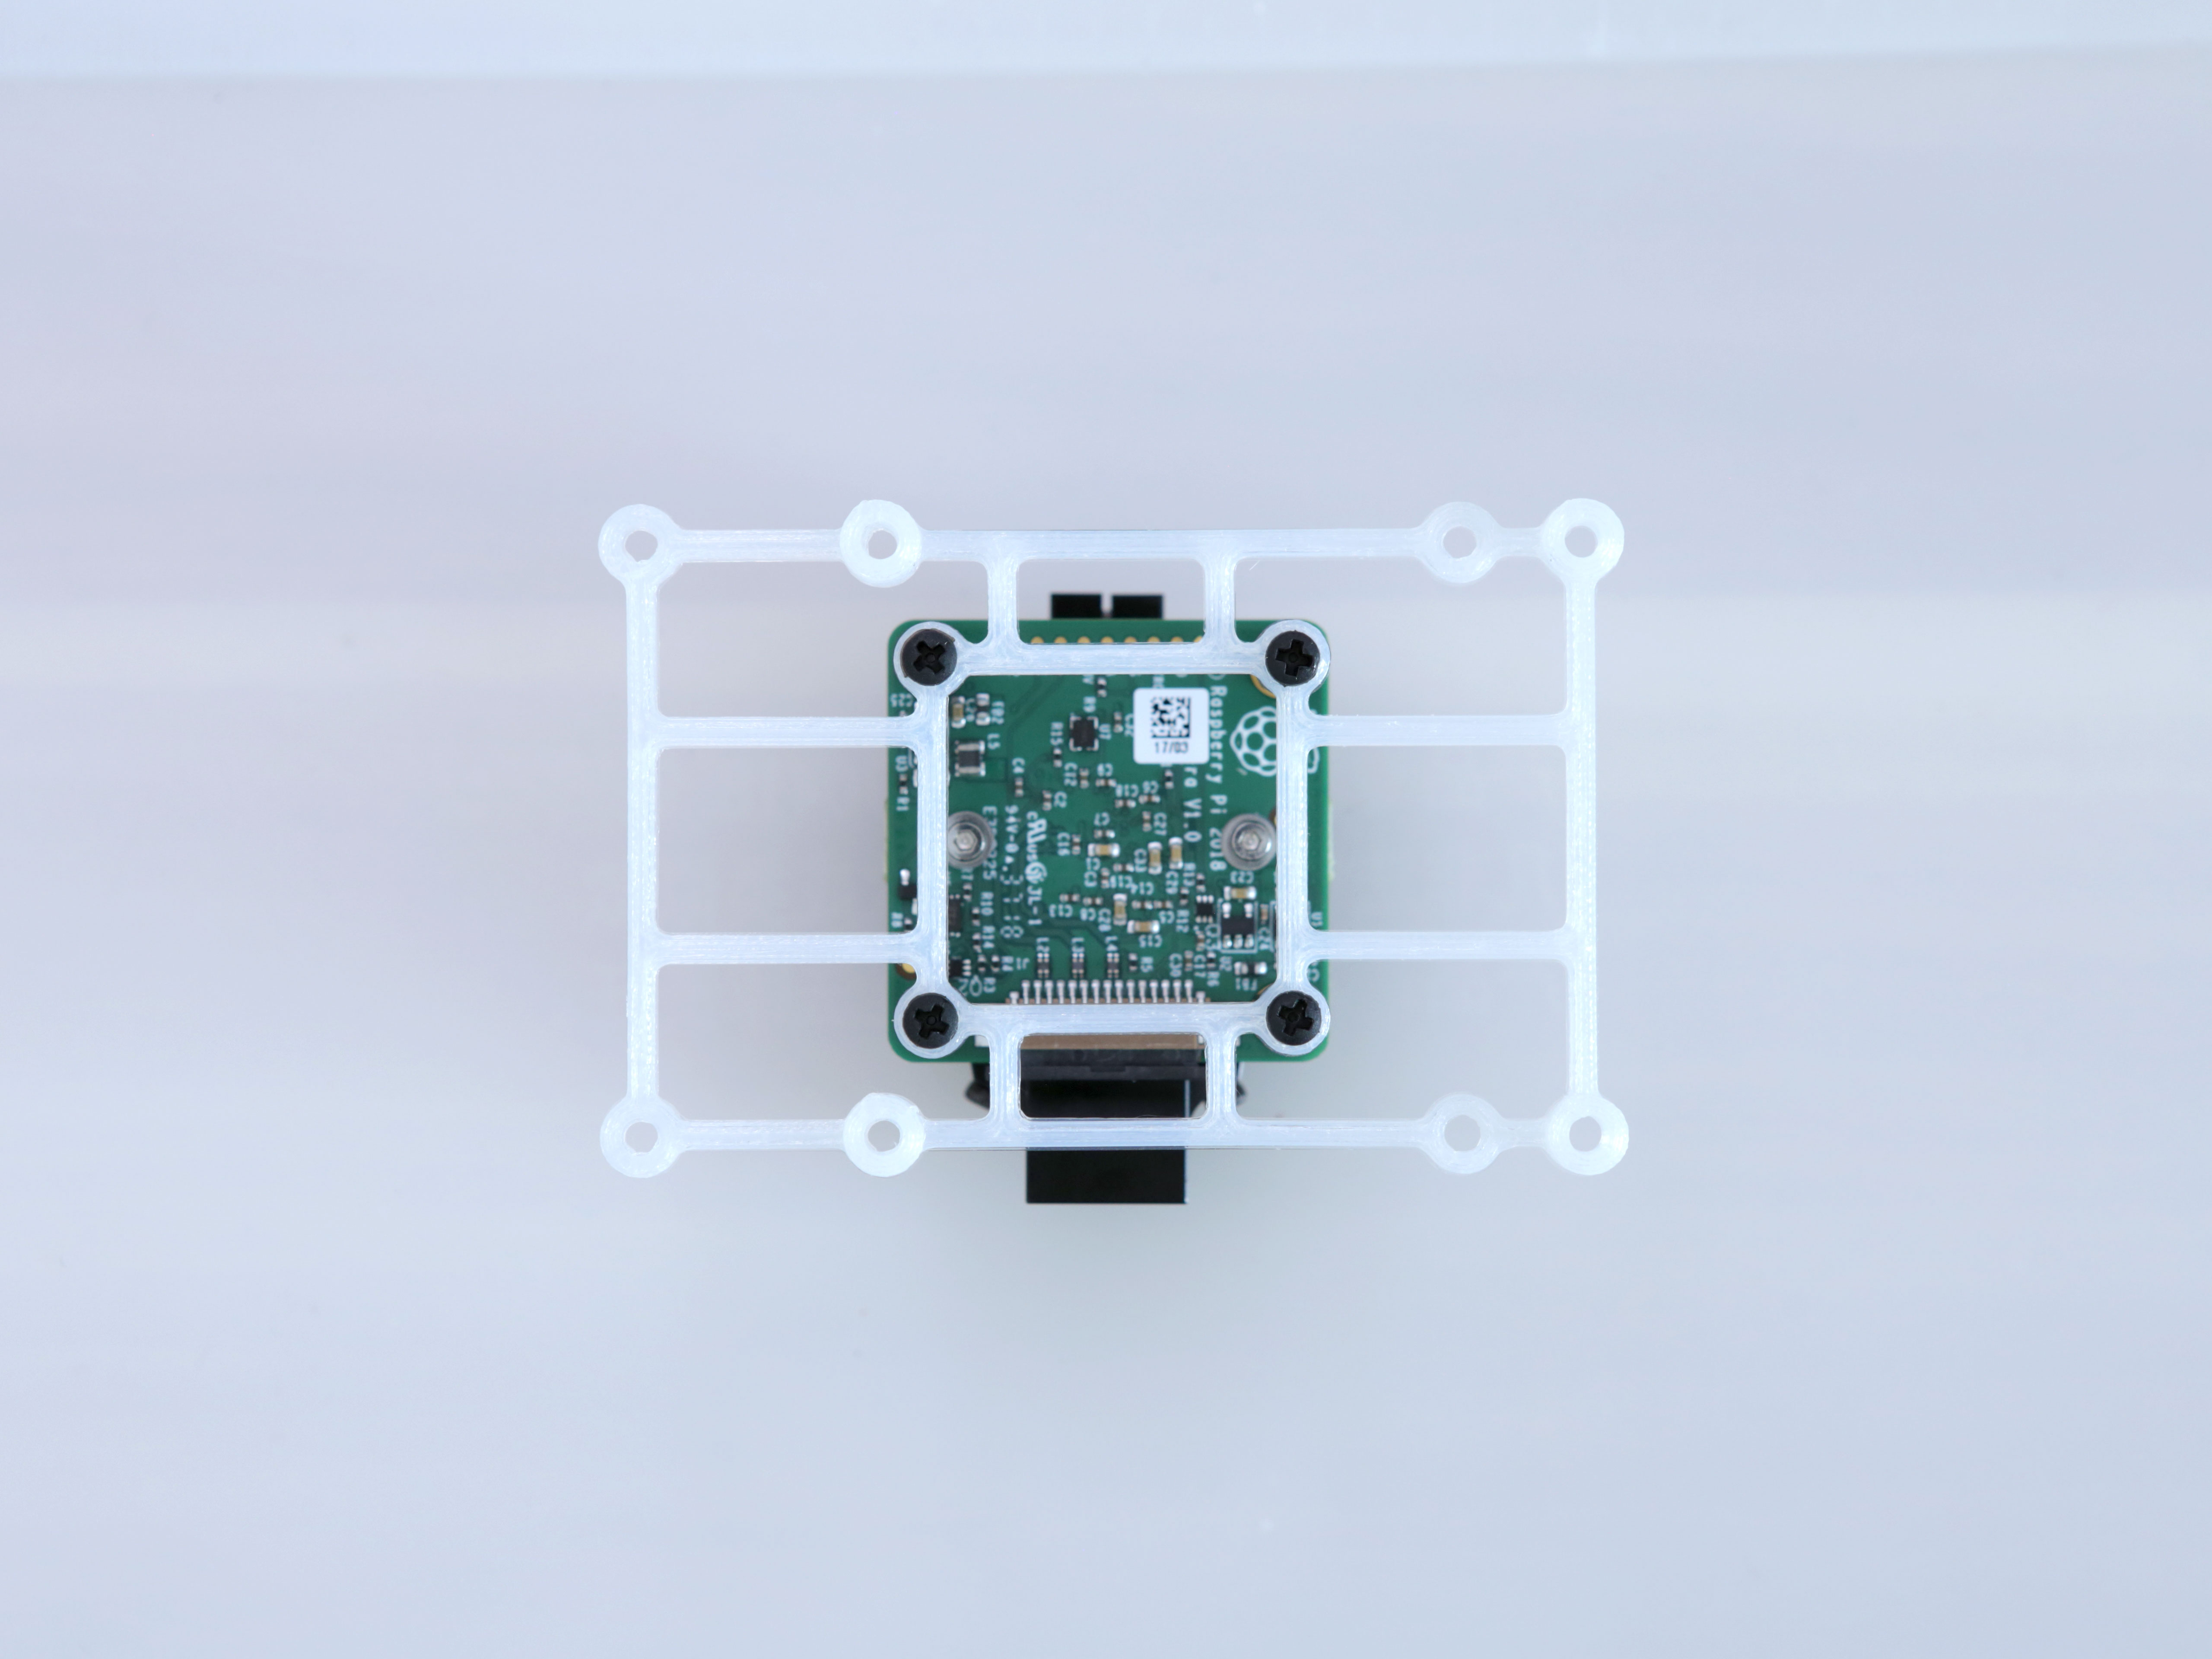 raspberry_pi_picam-mount-installed.jpg